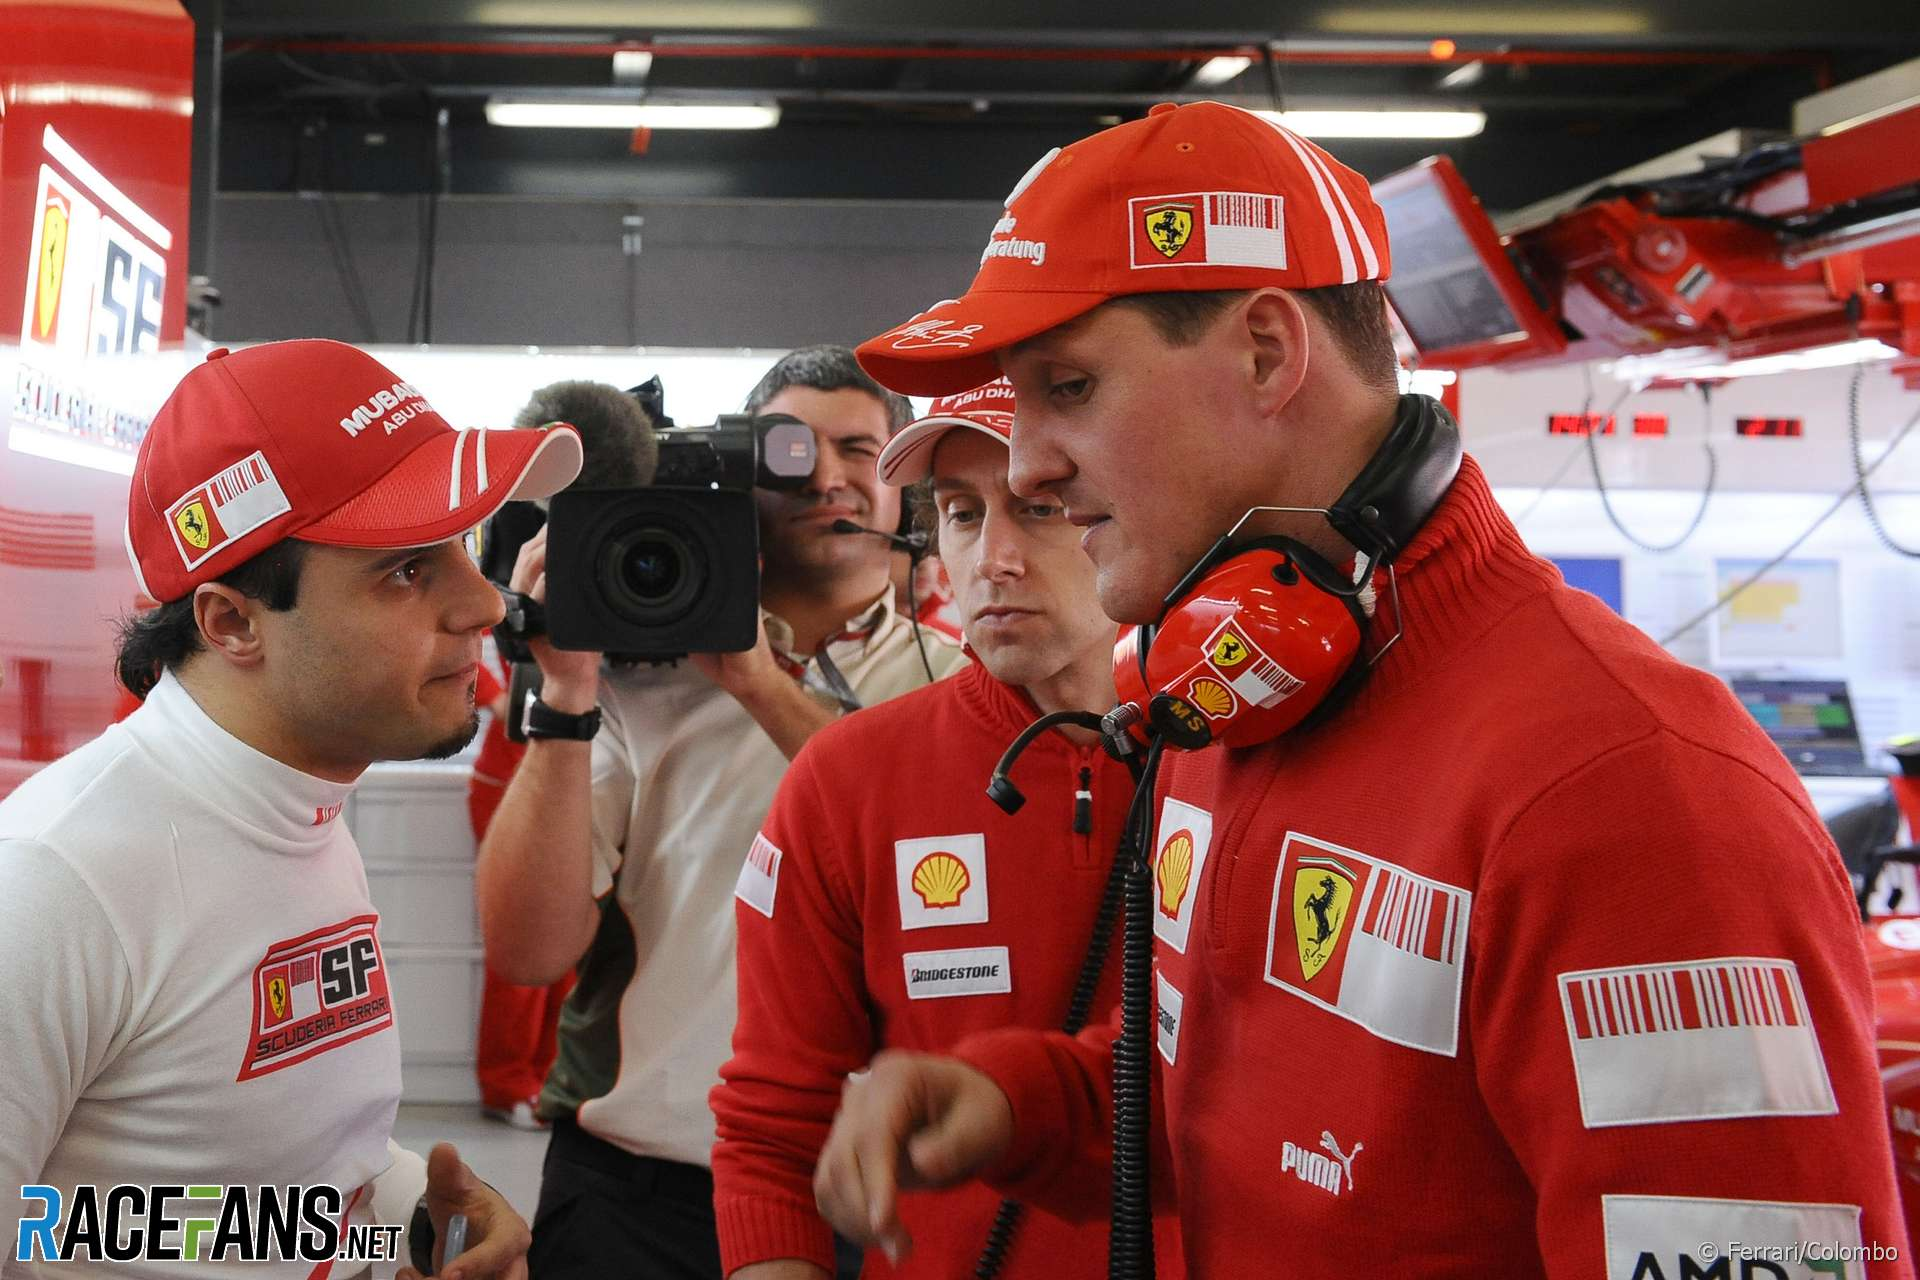 Michael Schumacher joins Mercedes F1 team for 2010 - Official